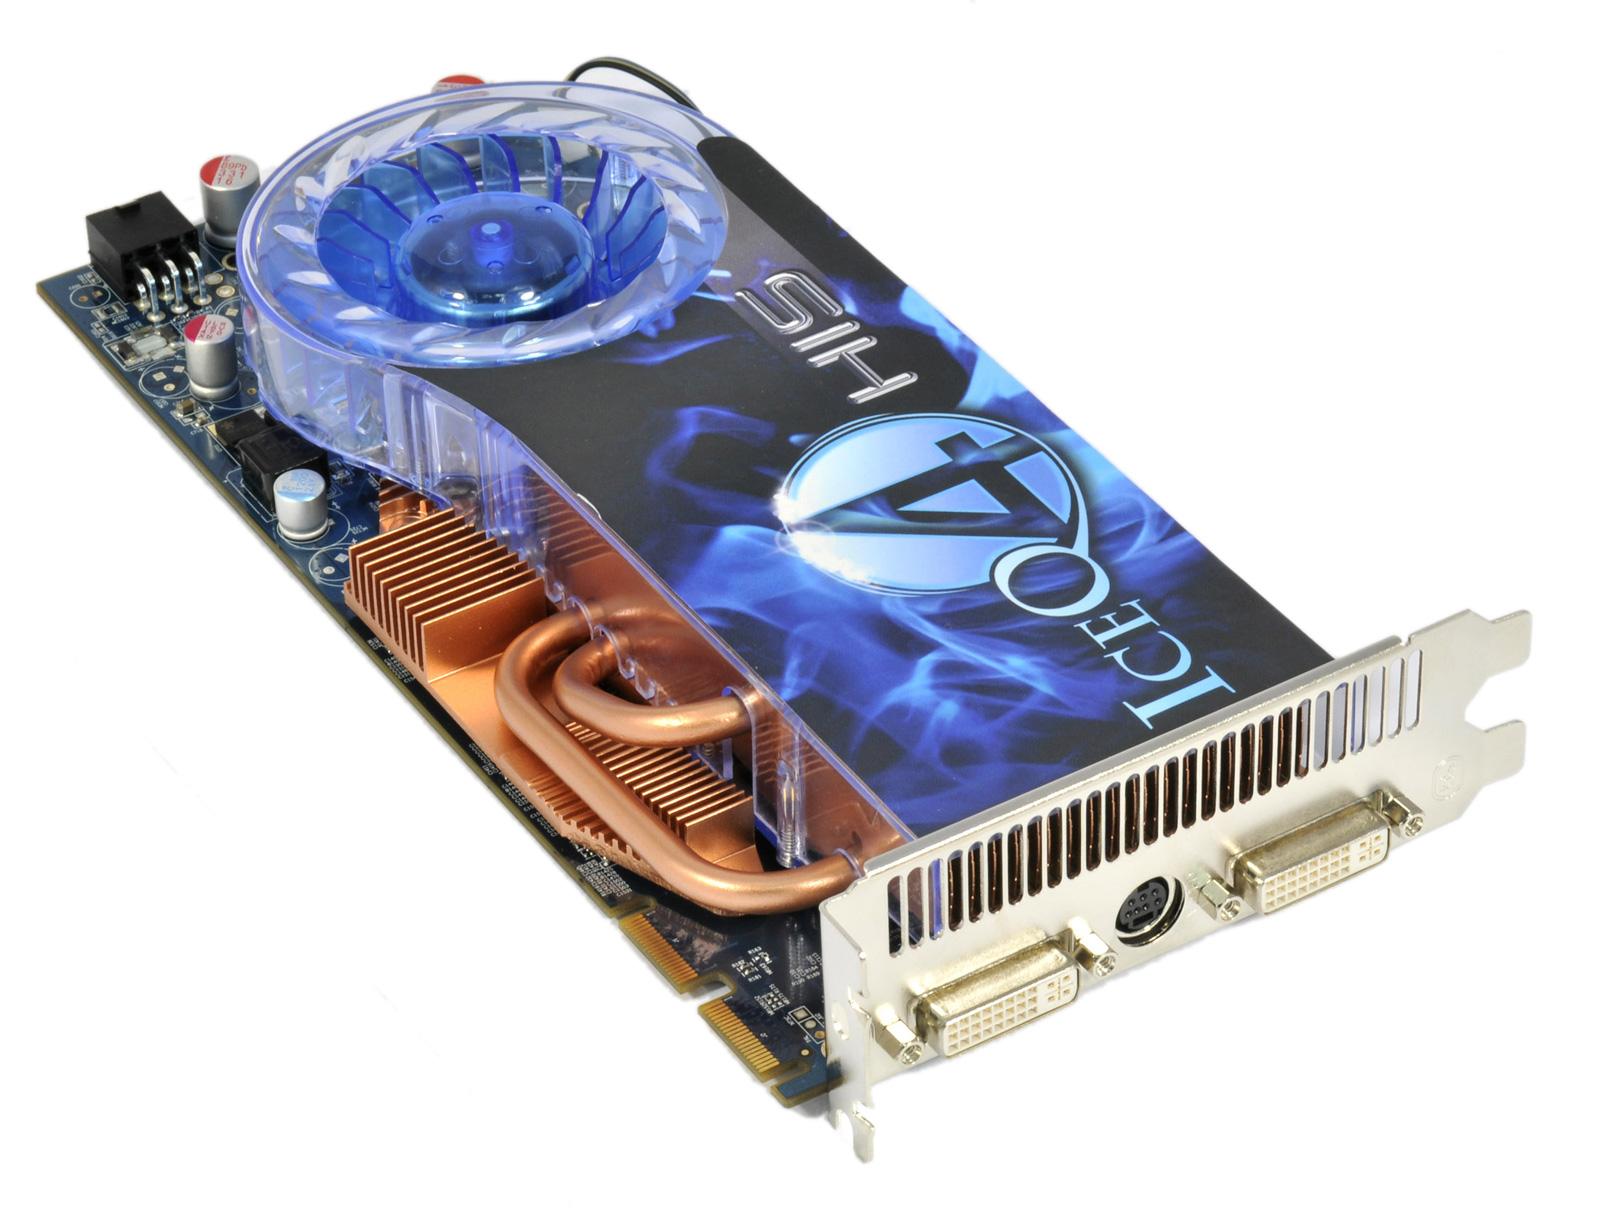 HIS HD 4850 IceQ 4 1GB256bit GDDR3 PCIe Legacy Products Desktop Graphics